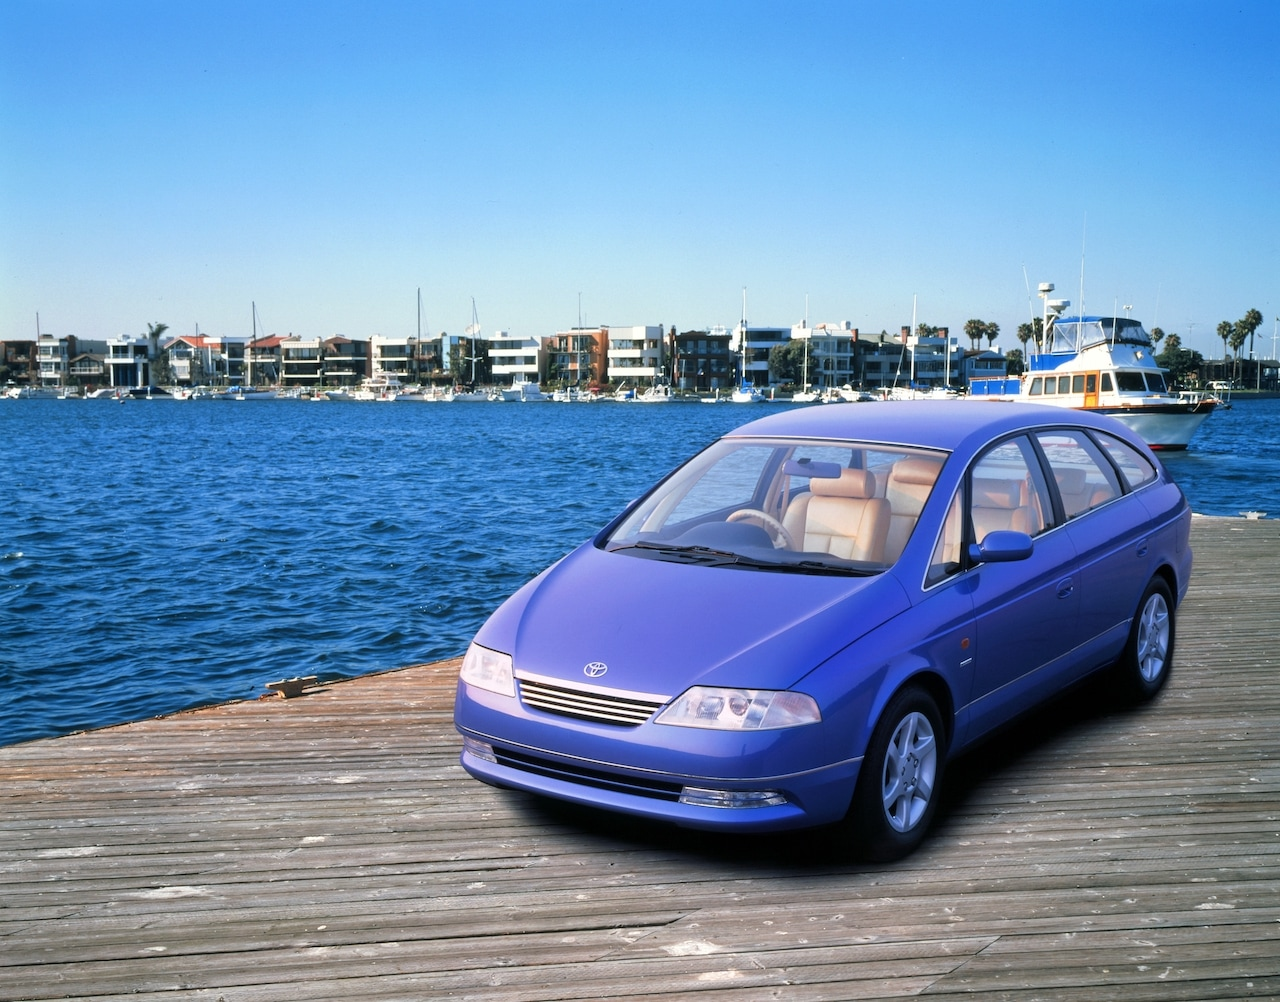 Model Lexus FLV je luxusné auto budúcnosti z roku 1994